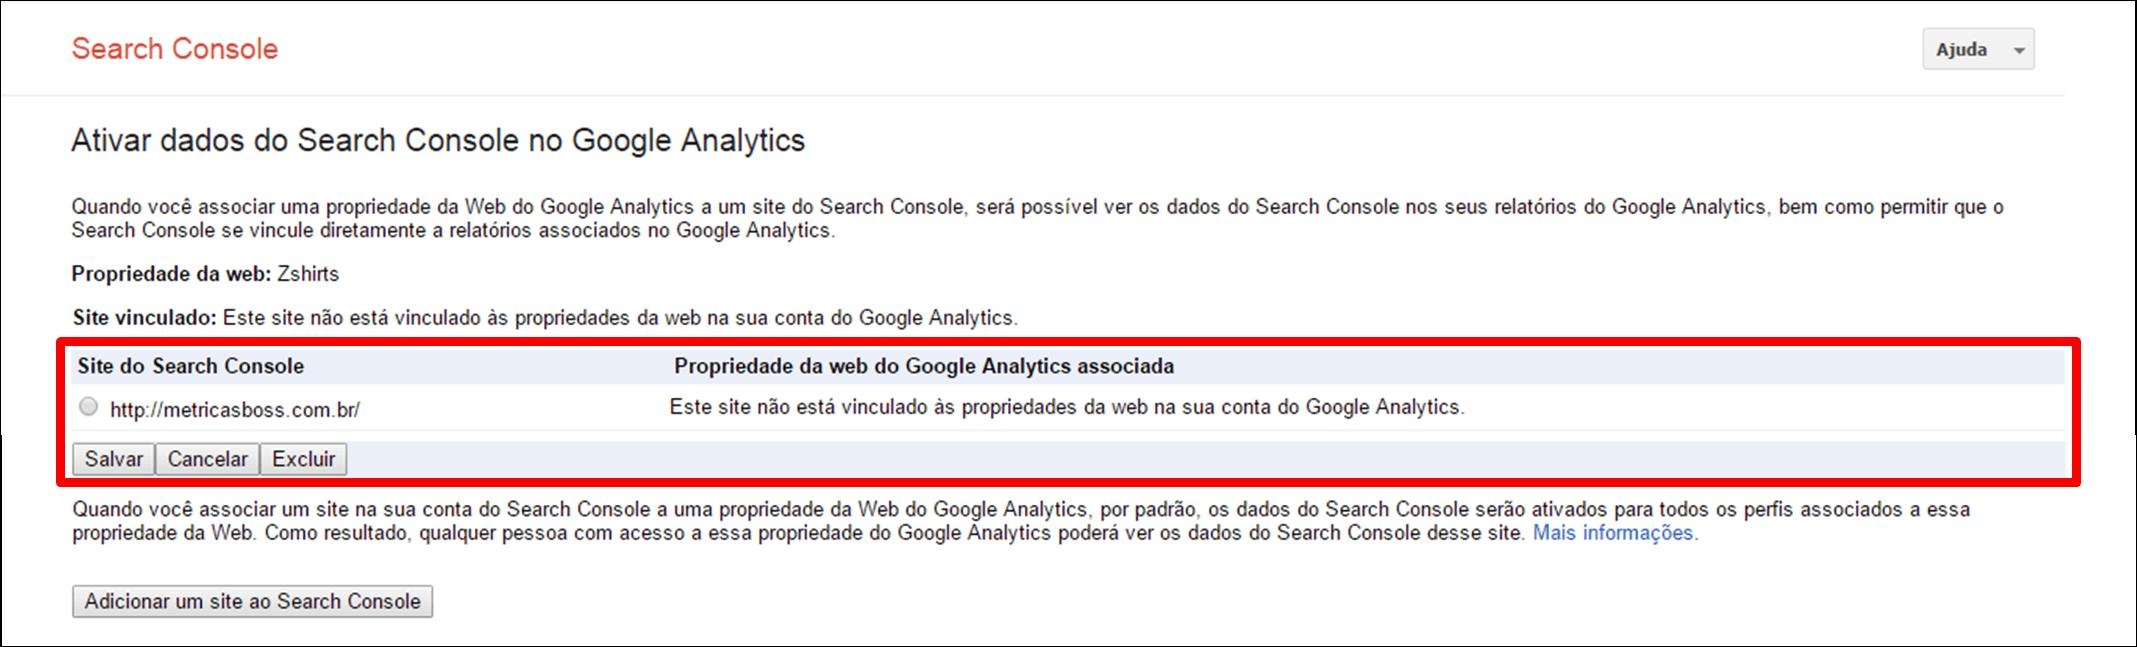 integrando-google-web-master-tools-com-google-analytics-5.png